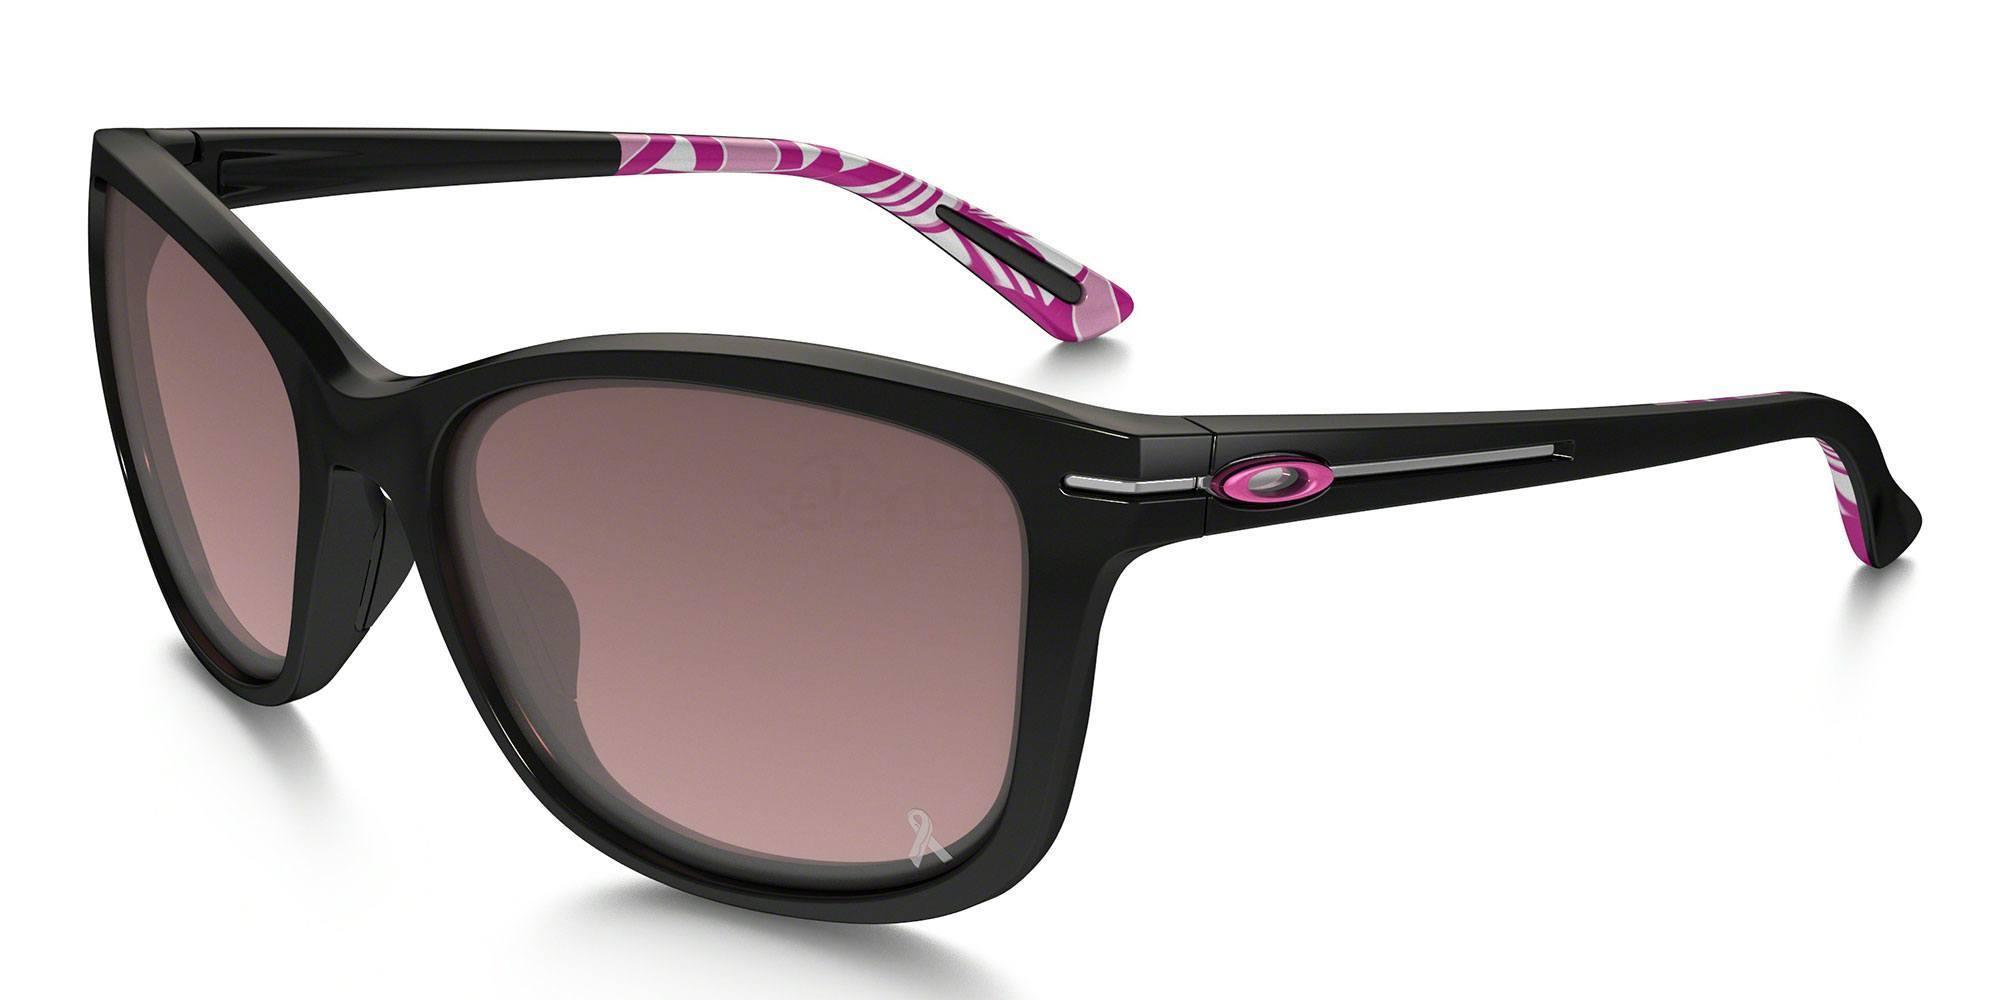 923212 OO9232 BREAST CANCER AWARENESS DROP IN Sunglasses, Oakley Ladies